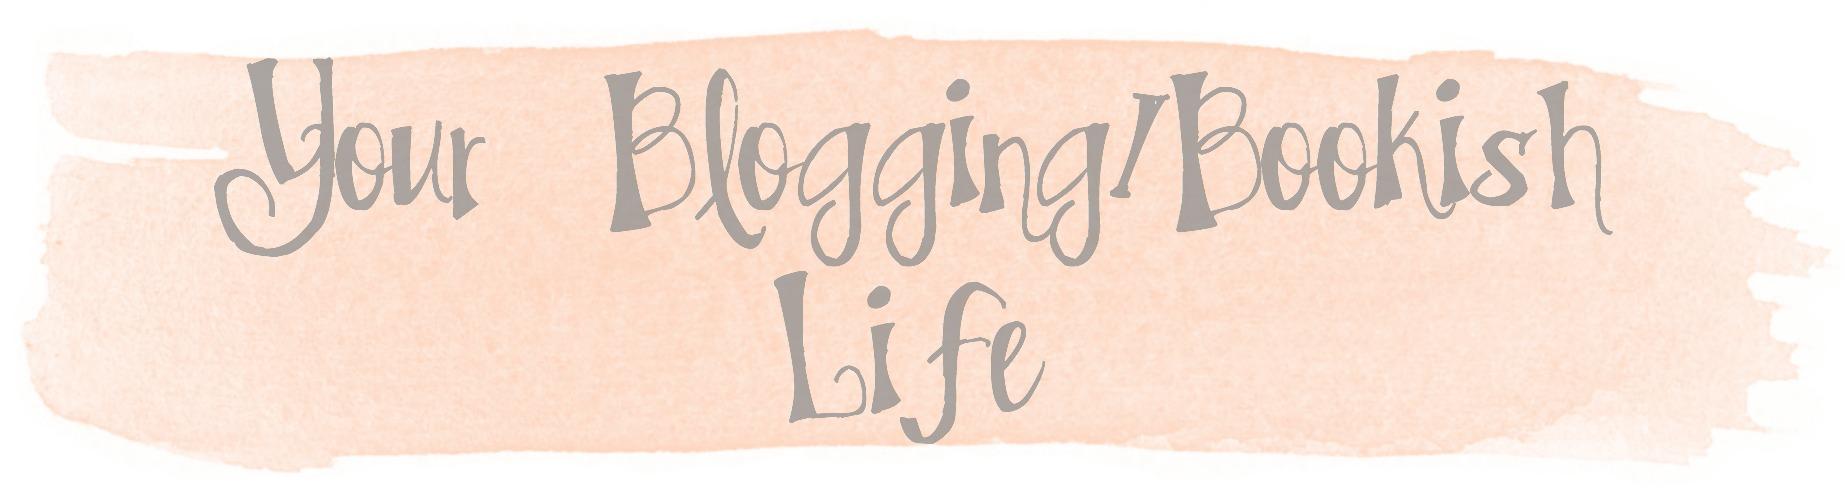 Book Blogging Banner